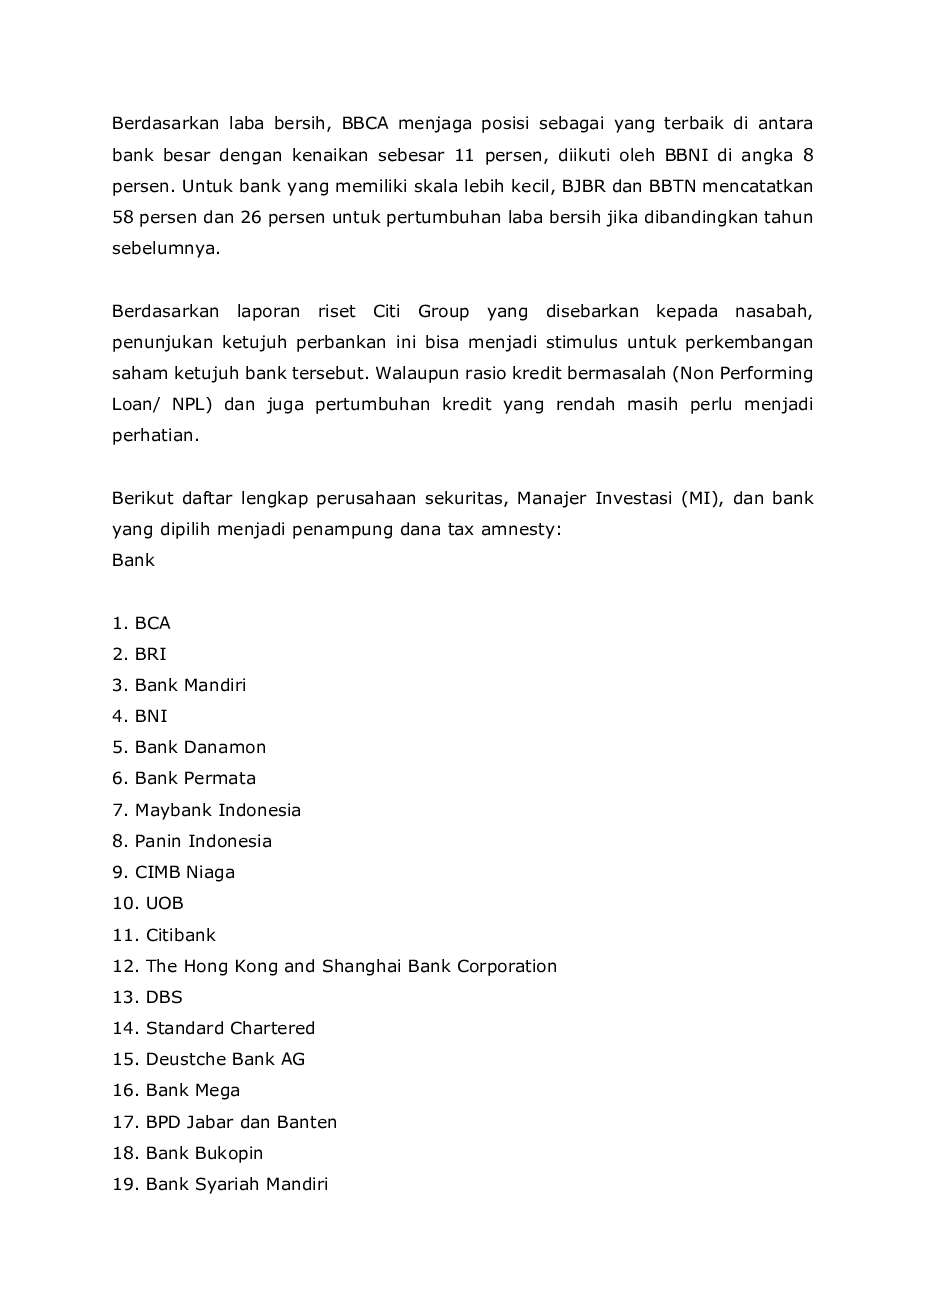 Jual Buku Prospek Investasi 2016 Sentul City Tbk Per Laporan Keungan Q3 2016 Oleh Buddy Setianto Gramedia Digital Indonesia